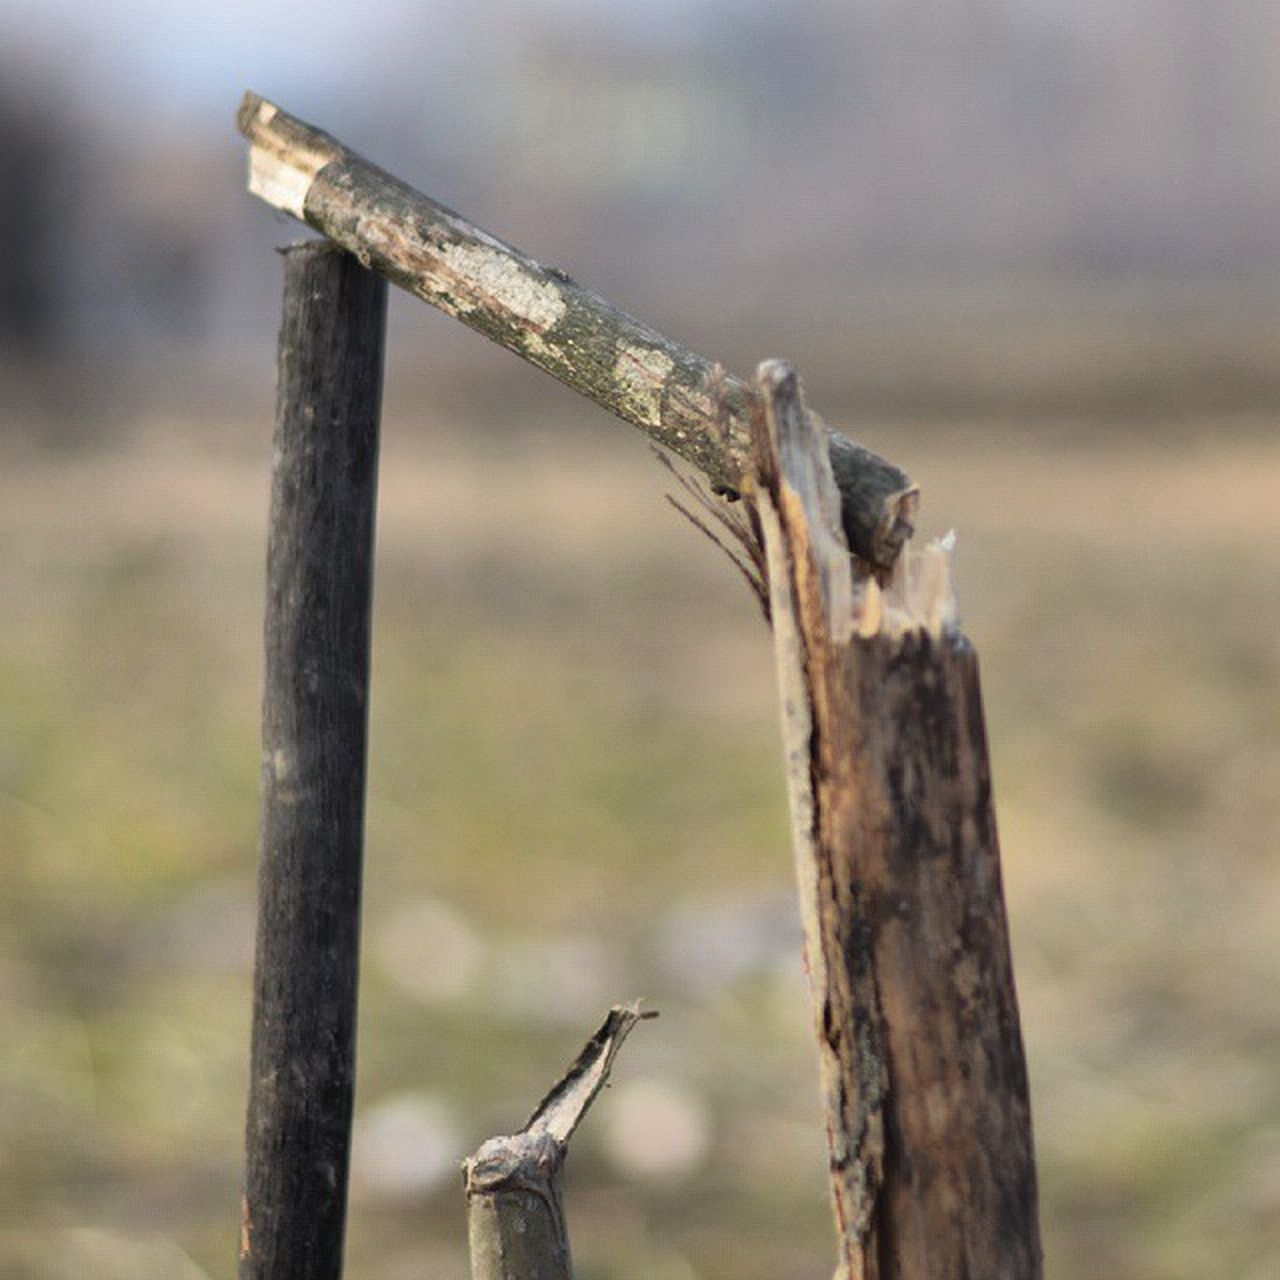 Stumps Cricket Field Game Bails Play Bandipur Kashmir IExploreKashmir IAmKashmir Iphotograph Revoshotsphotography Revo Revoshots IExplore Itravel Italk Ishoot Freedom